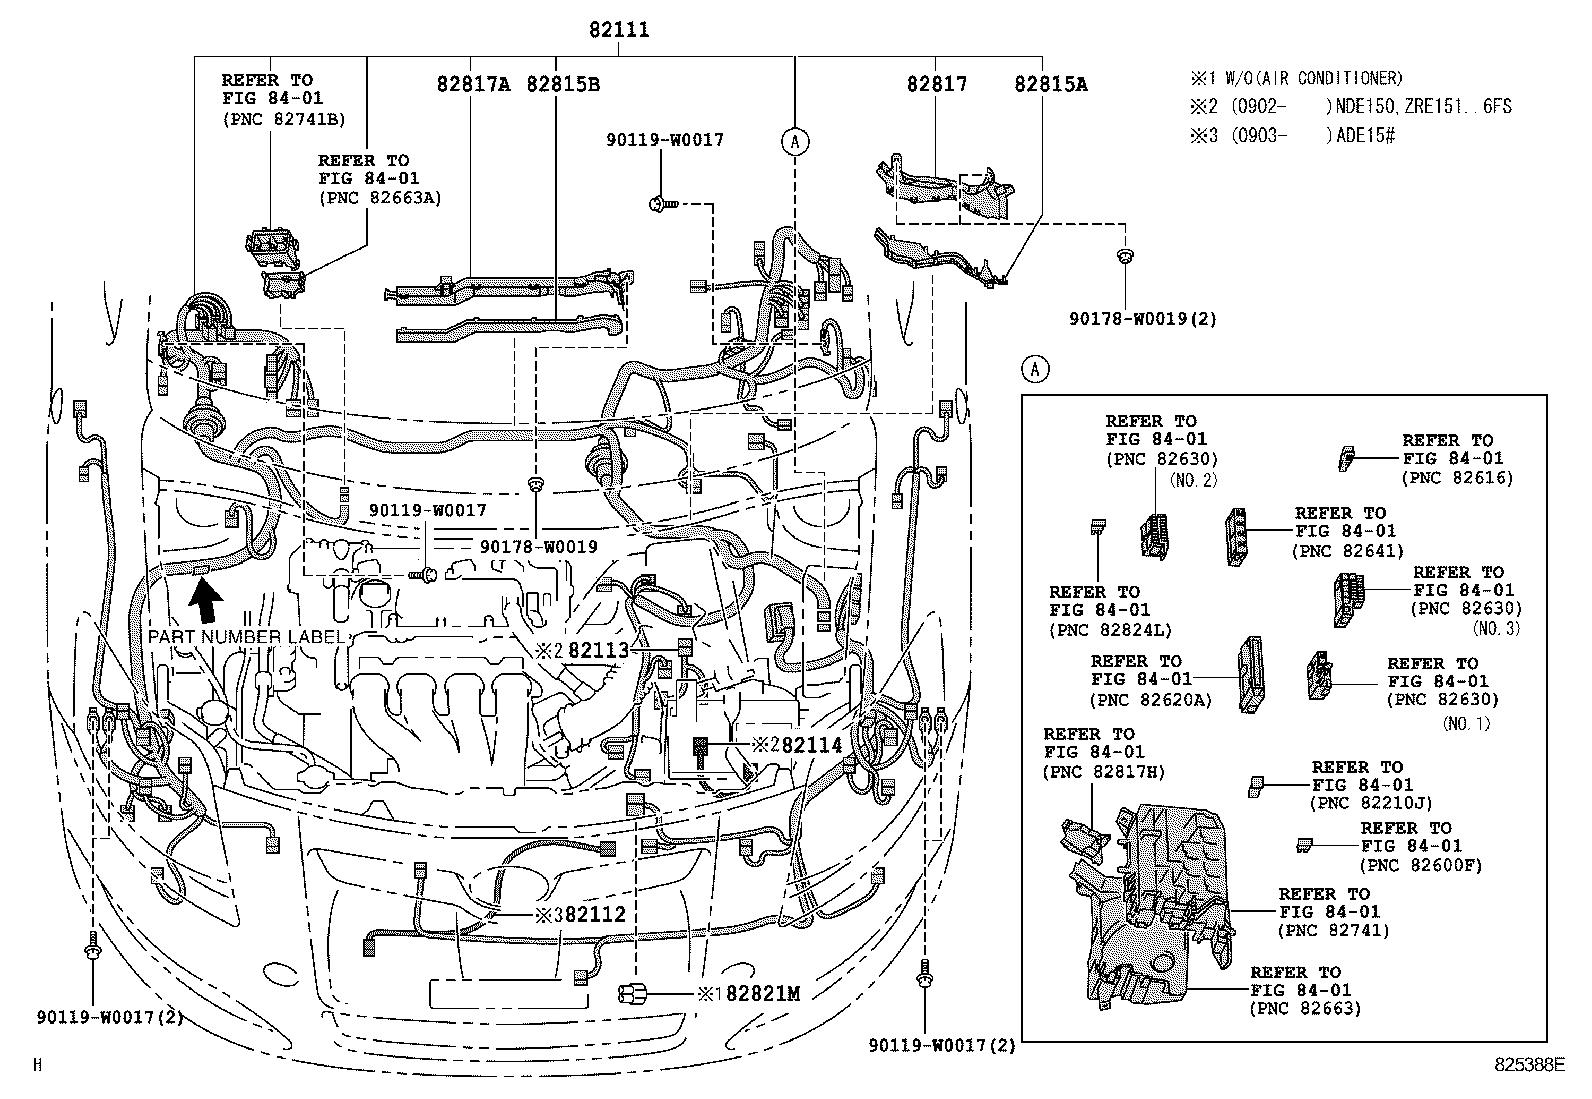 toyota auris hybridade157l-dhfnxw - electrical